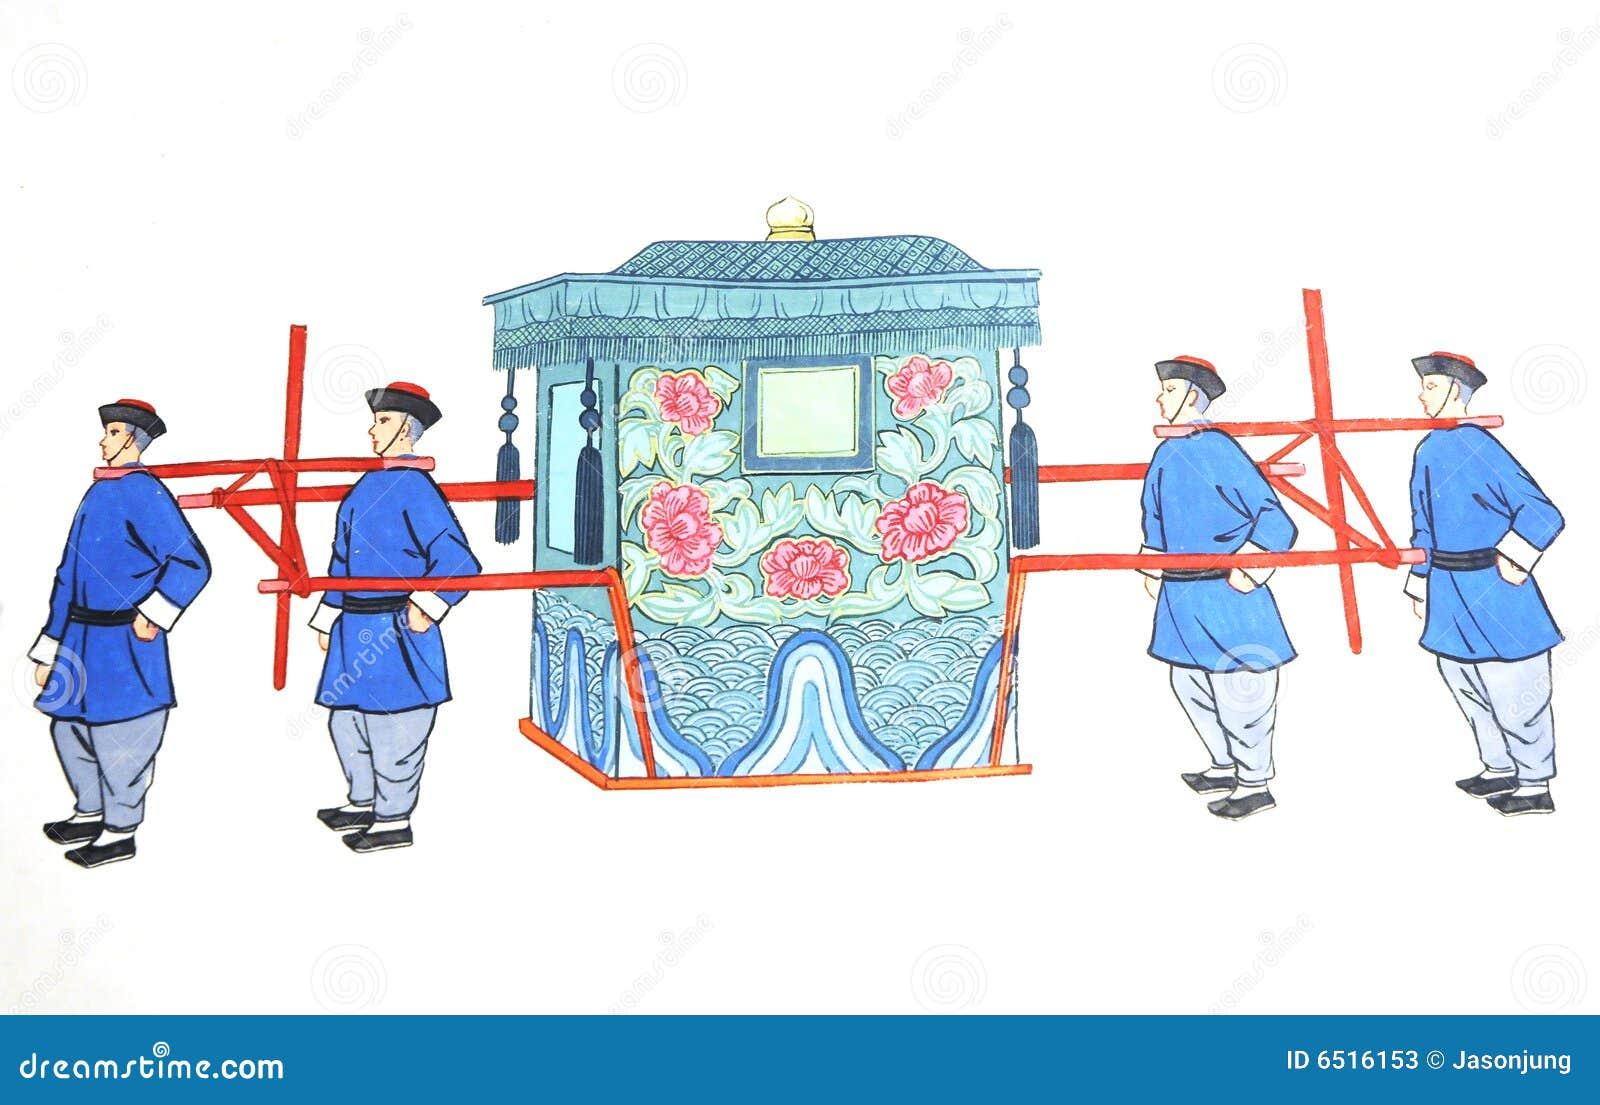 Chinese Sedan Chair For Bride Stock Image Image Of Folk Opera 6516153